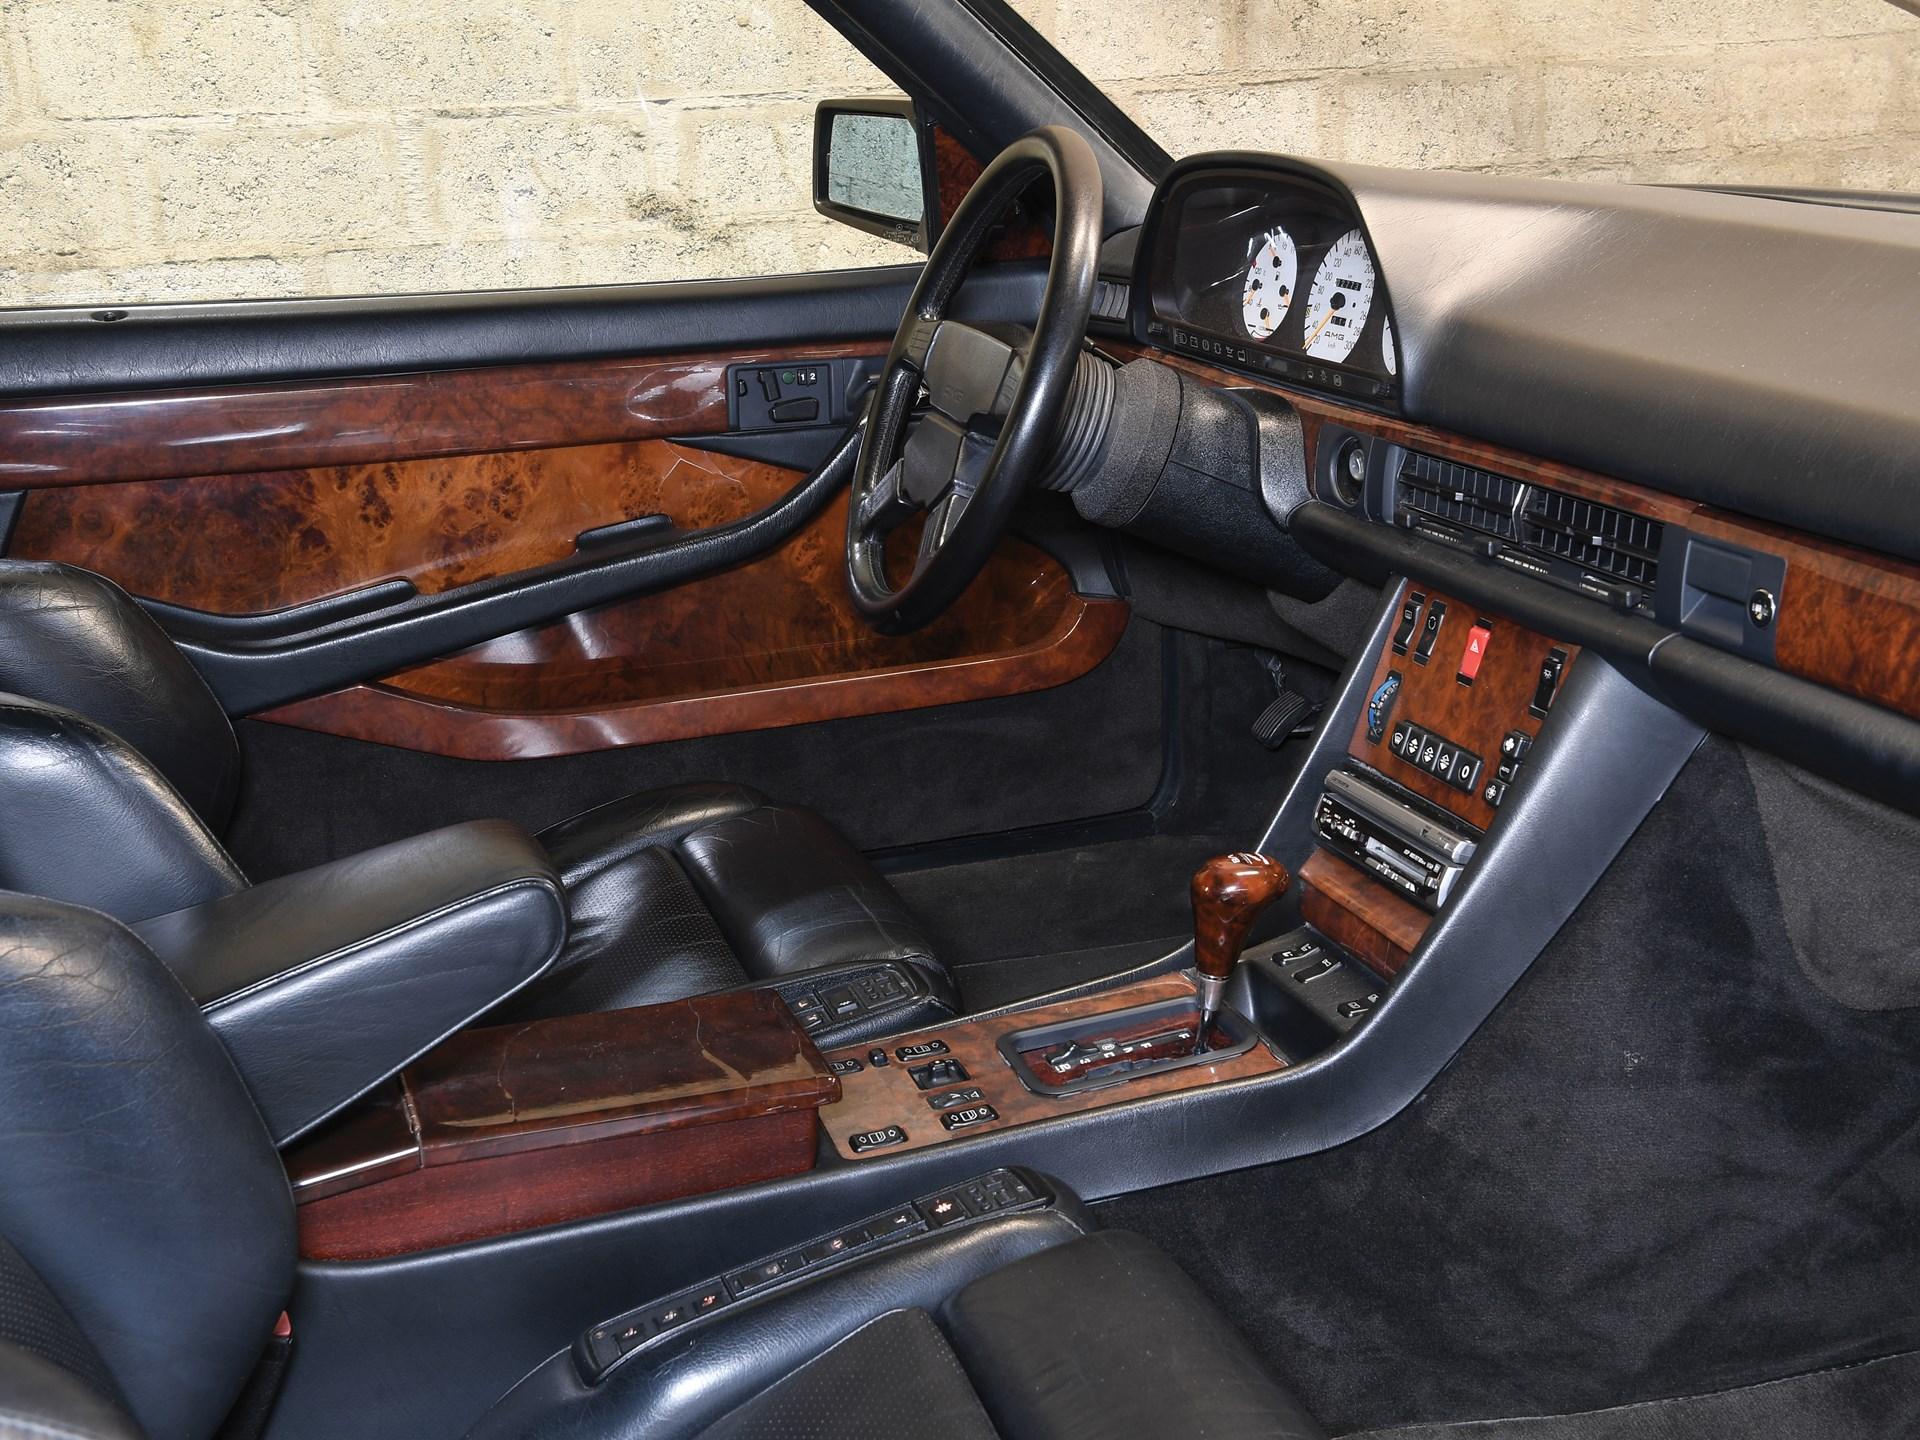 1989 Mercedes-Benz 560 SEC AMG 6.0 'Wide-Body'